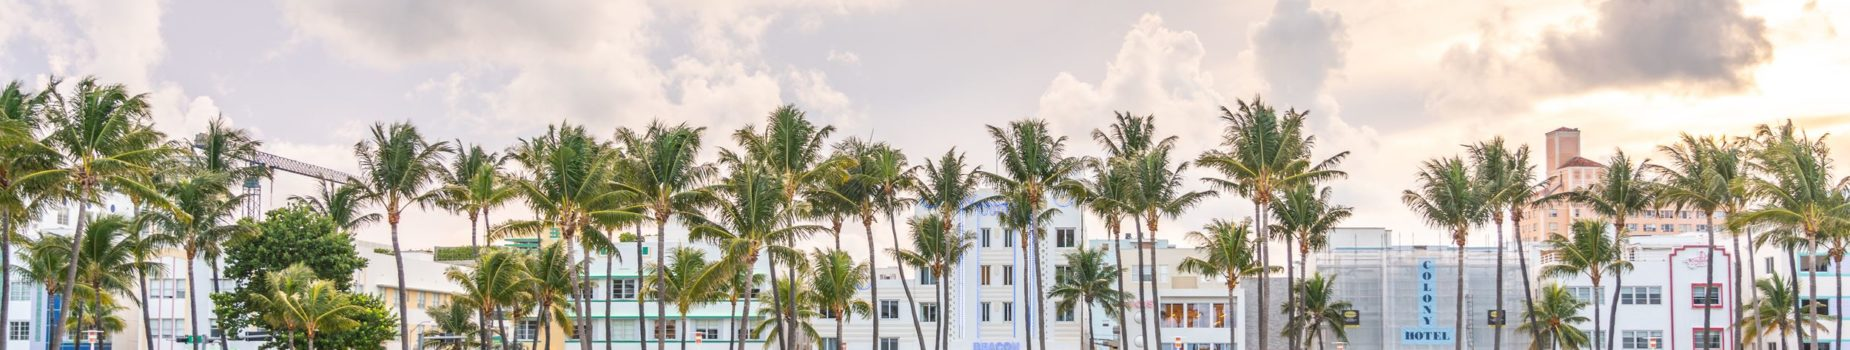 Fly Drive Miami